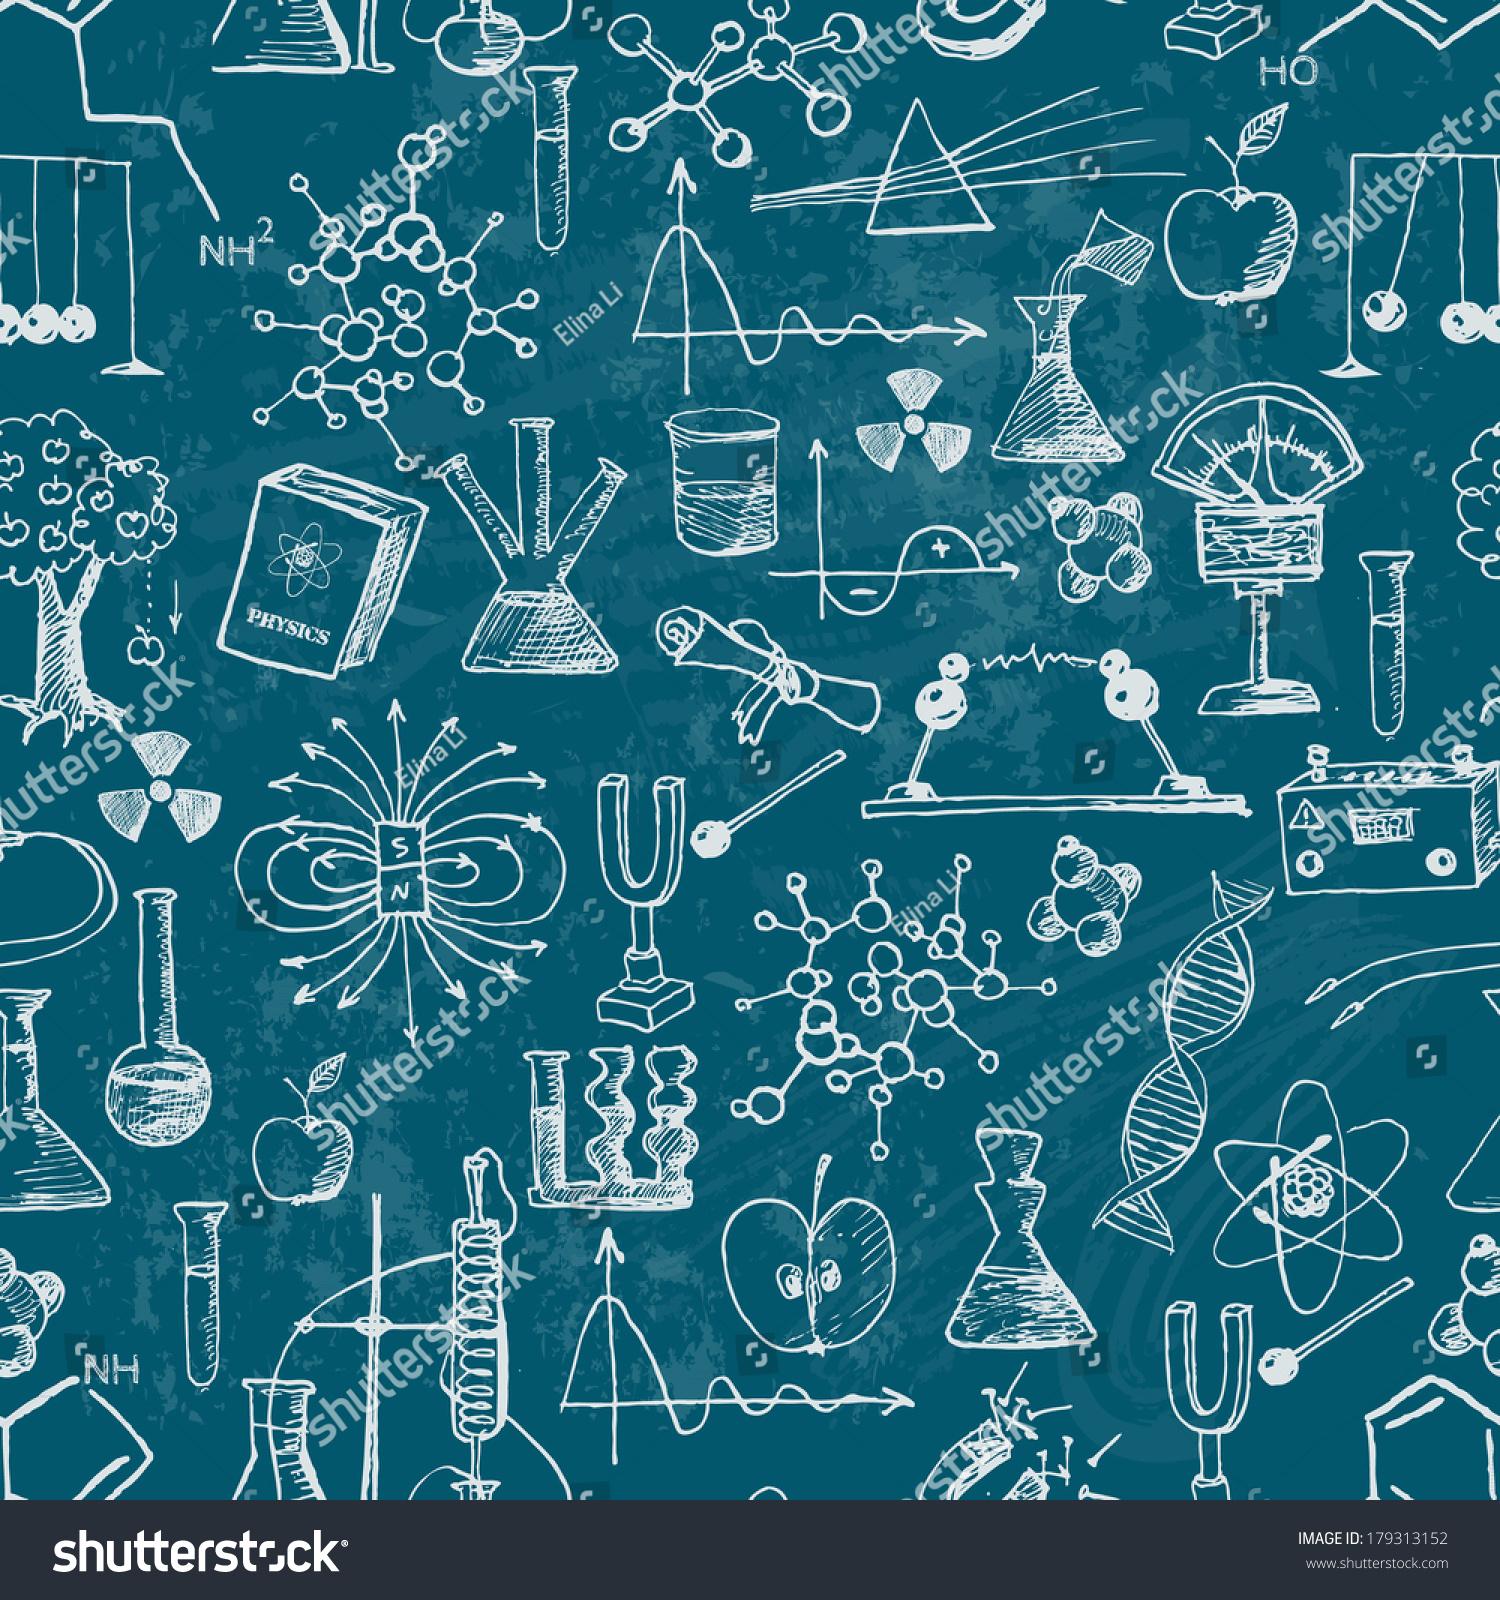 physics background stock photos - photo #9